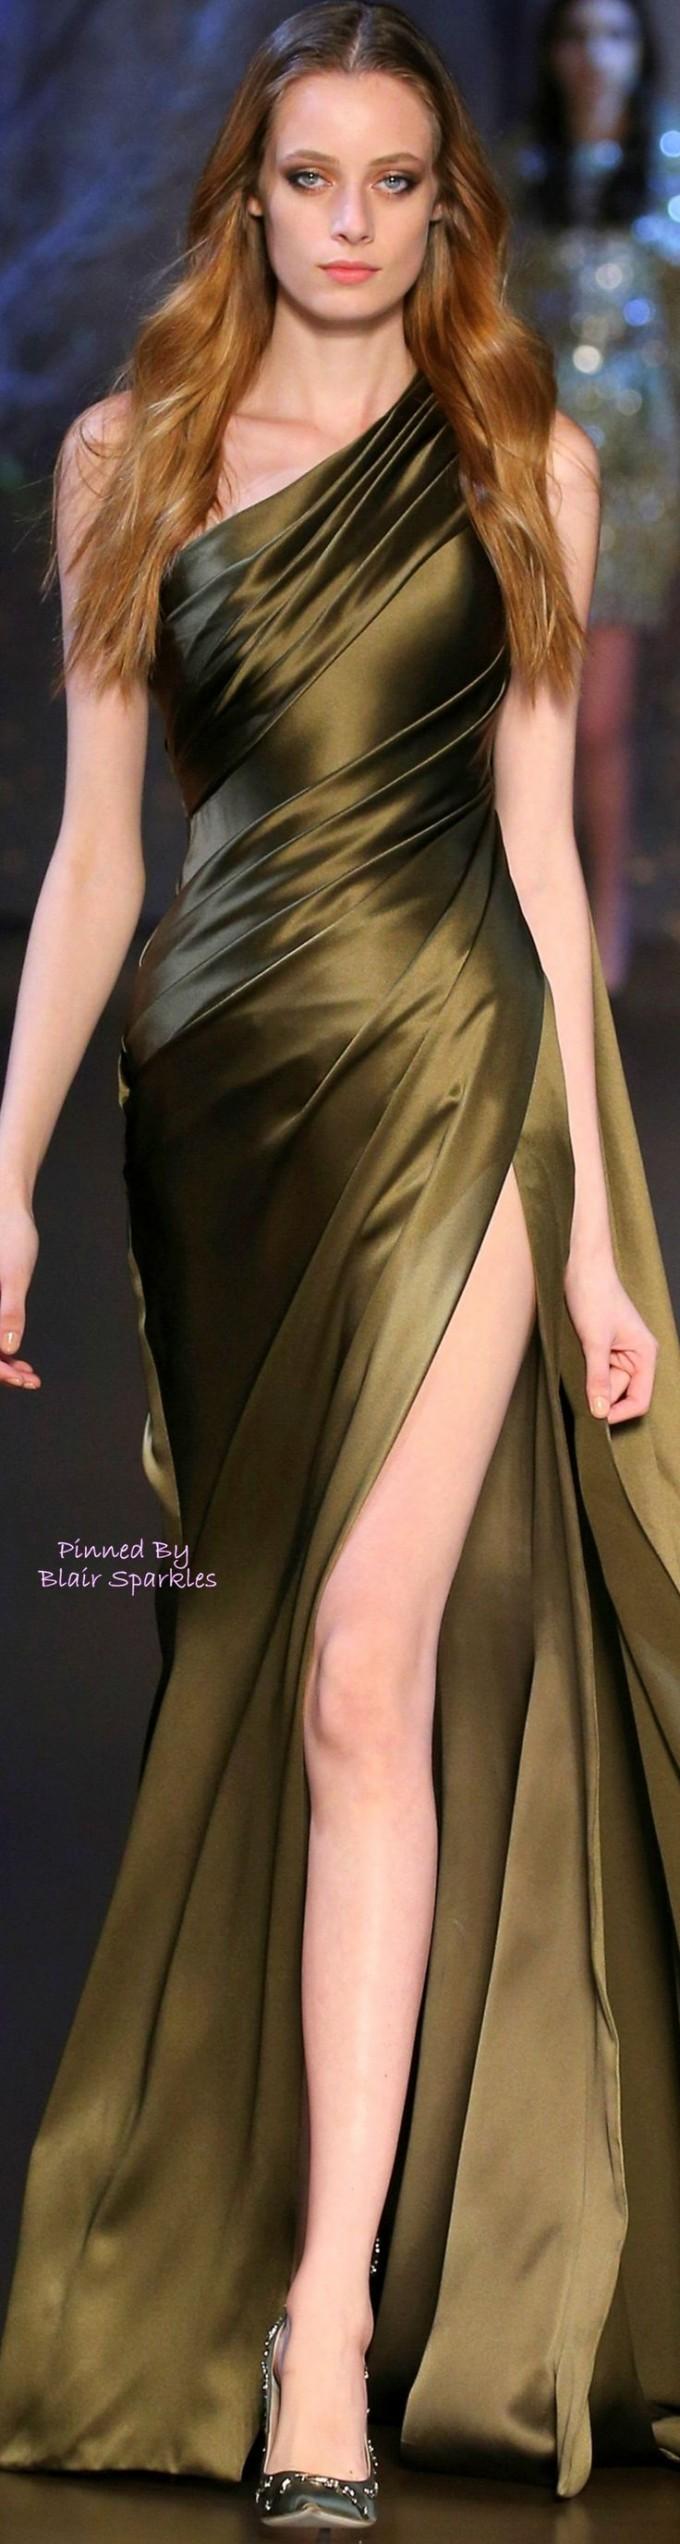 Masquerade Dresses | Chive Dresses | Macys Dresses